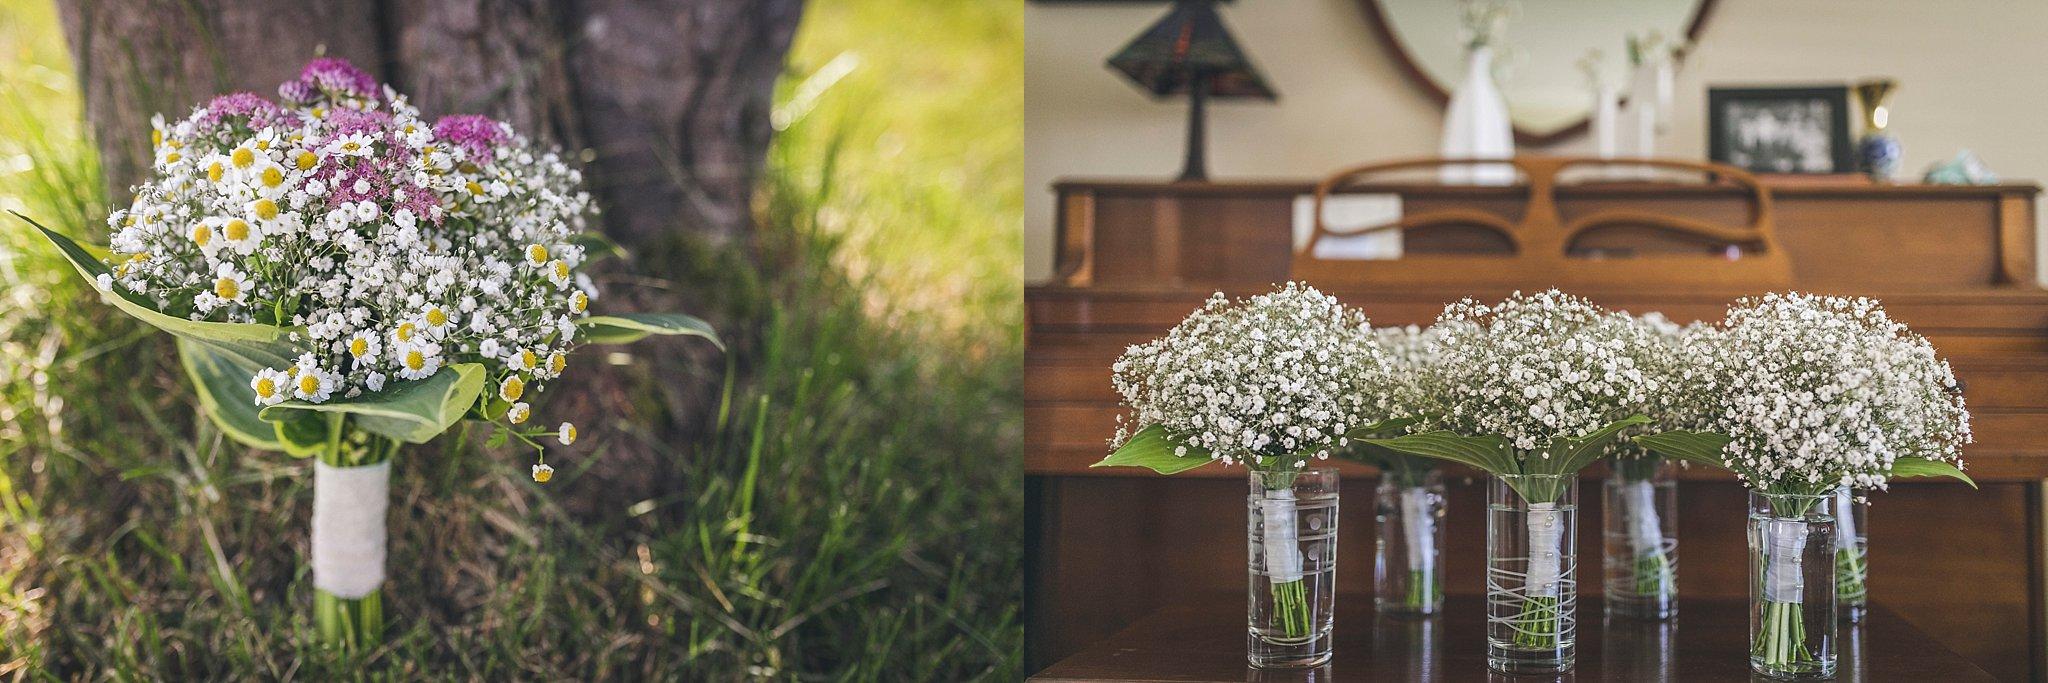 Wedding bouquets prepared by bride's friend at her St. John's, Newfoundland wedding